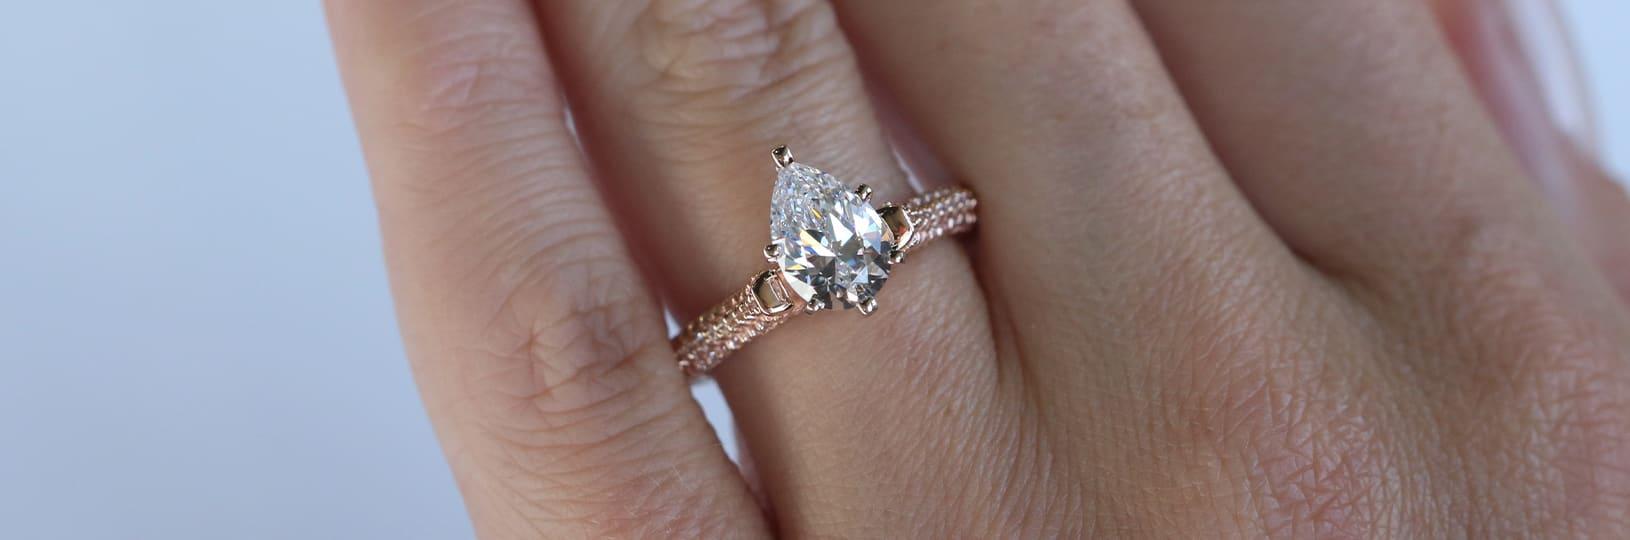 Pear cut pavé engagement ring